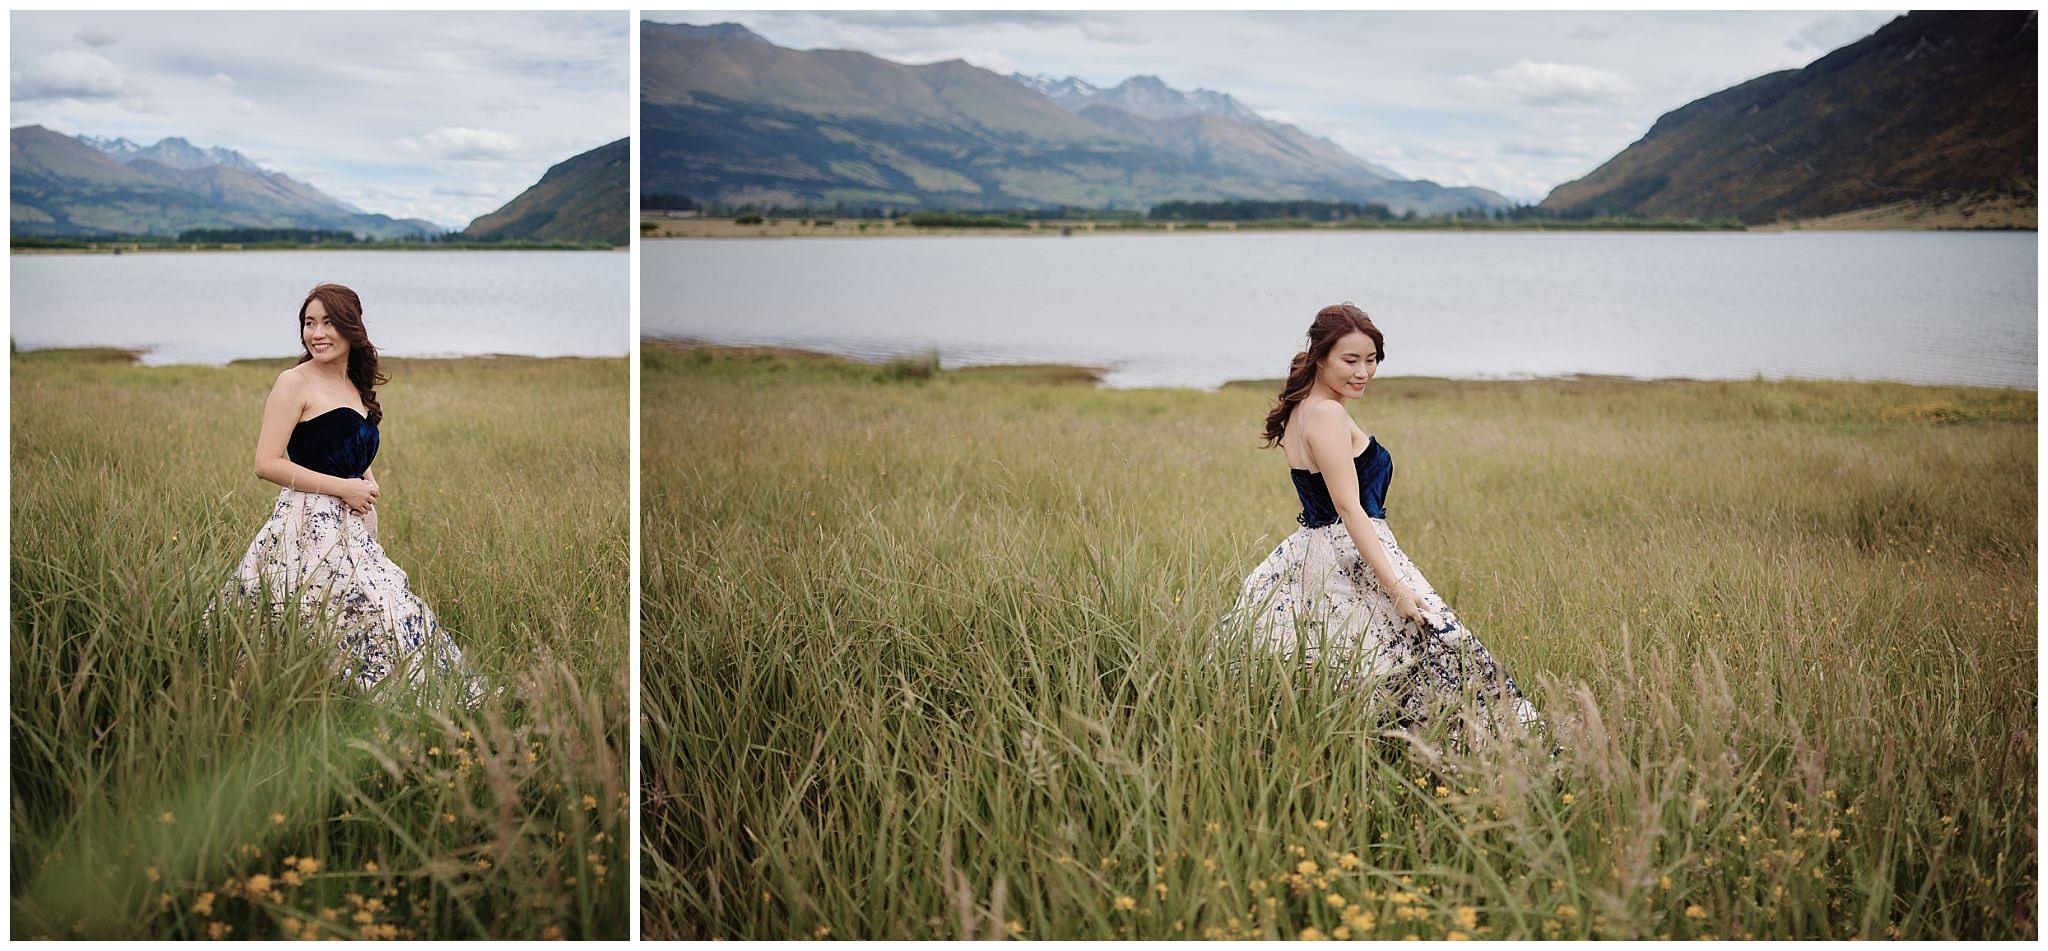 Queenstown New Zealand Prewedding Photographer_0059.jpg